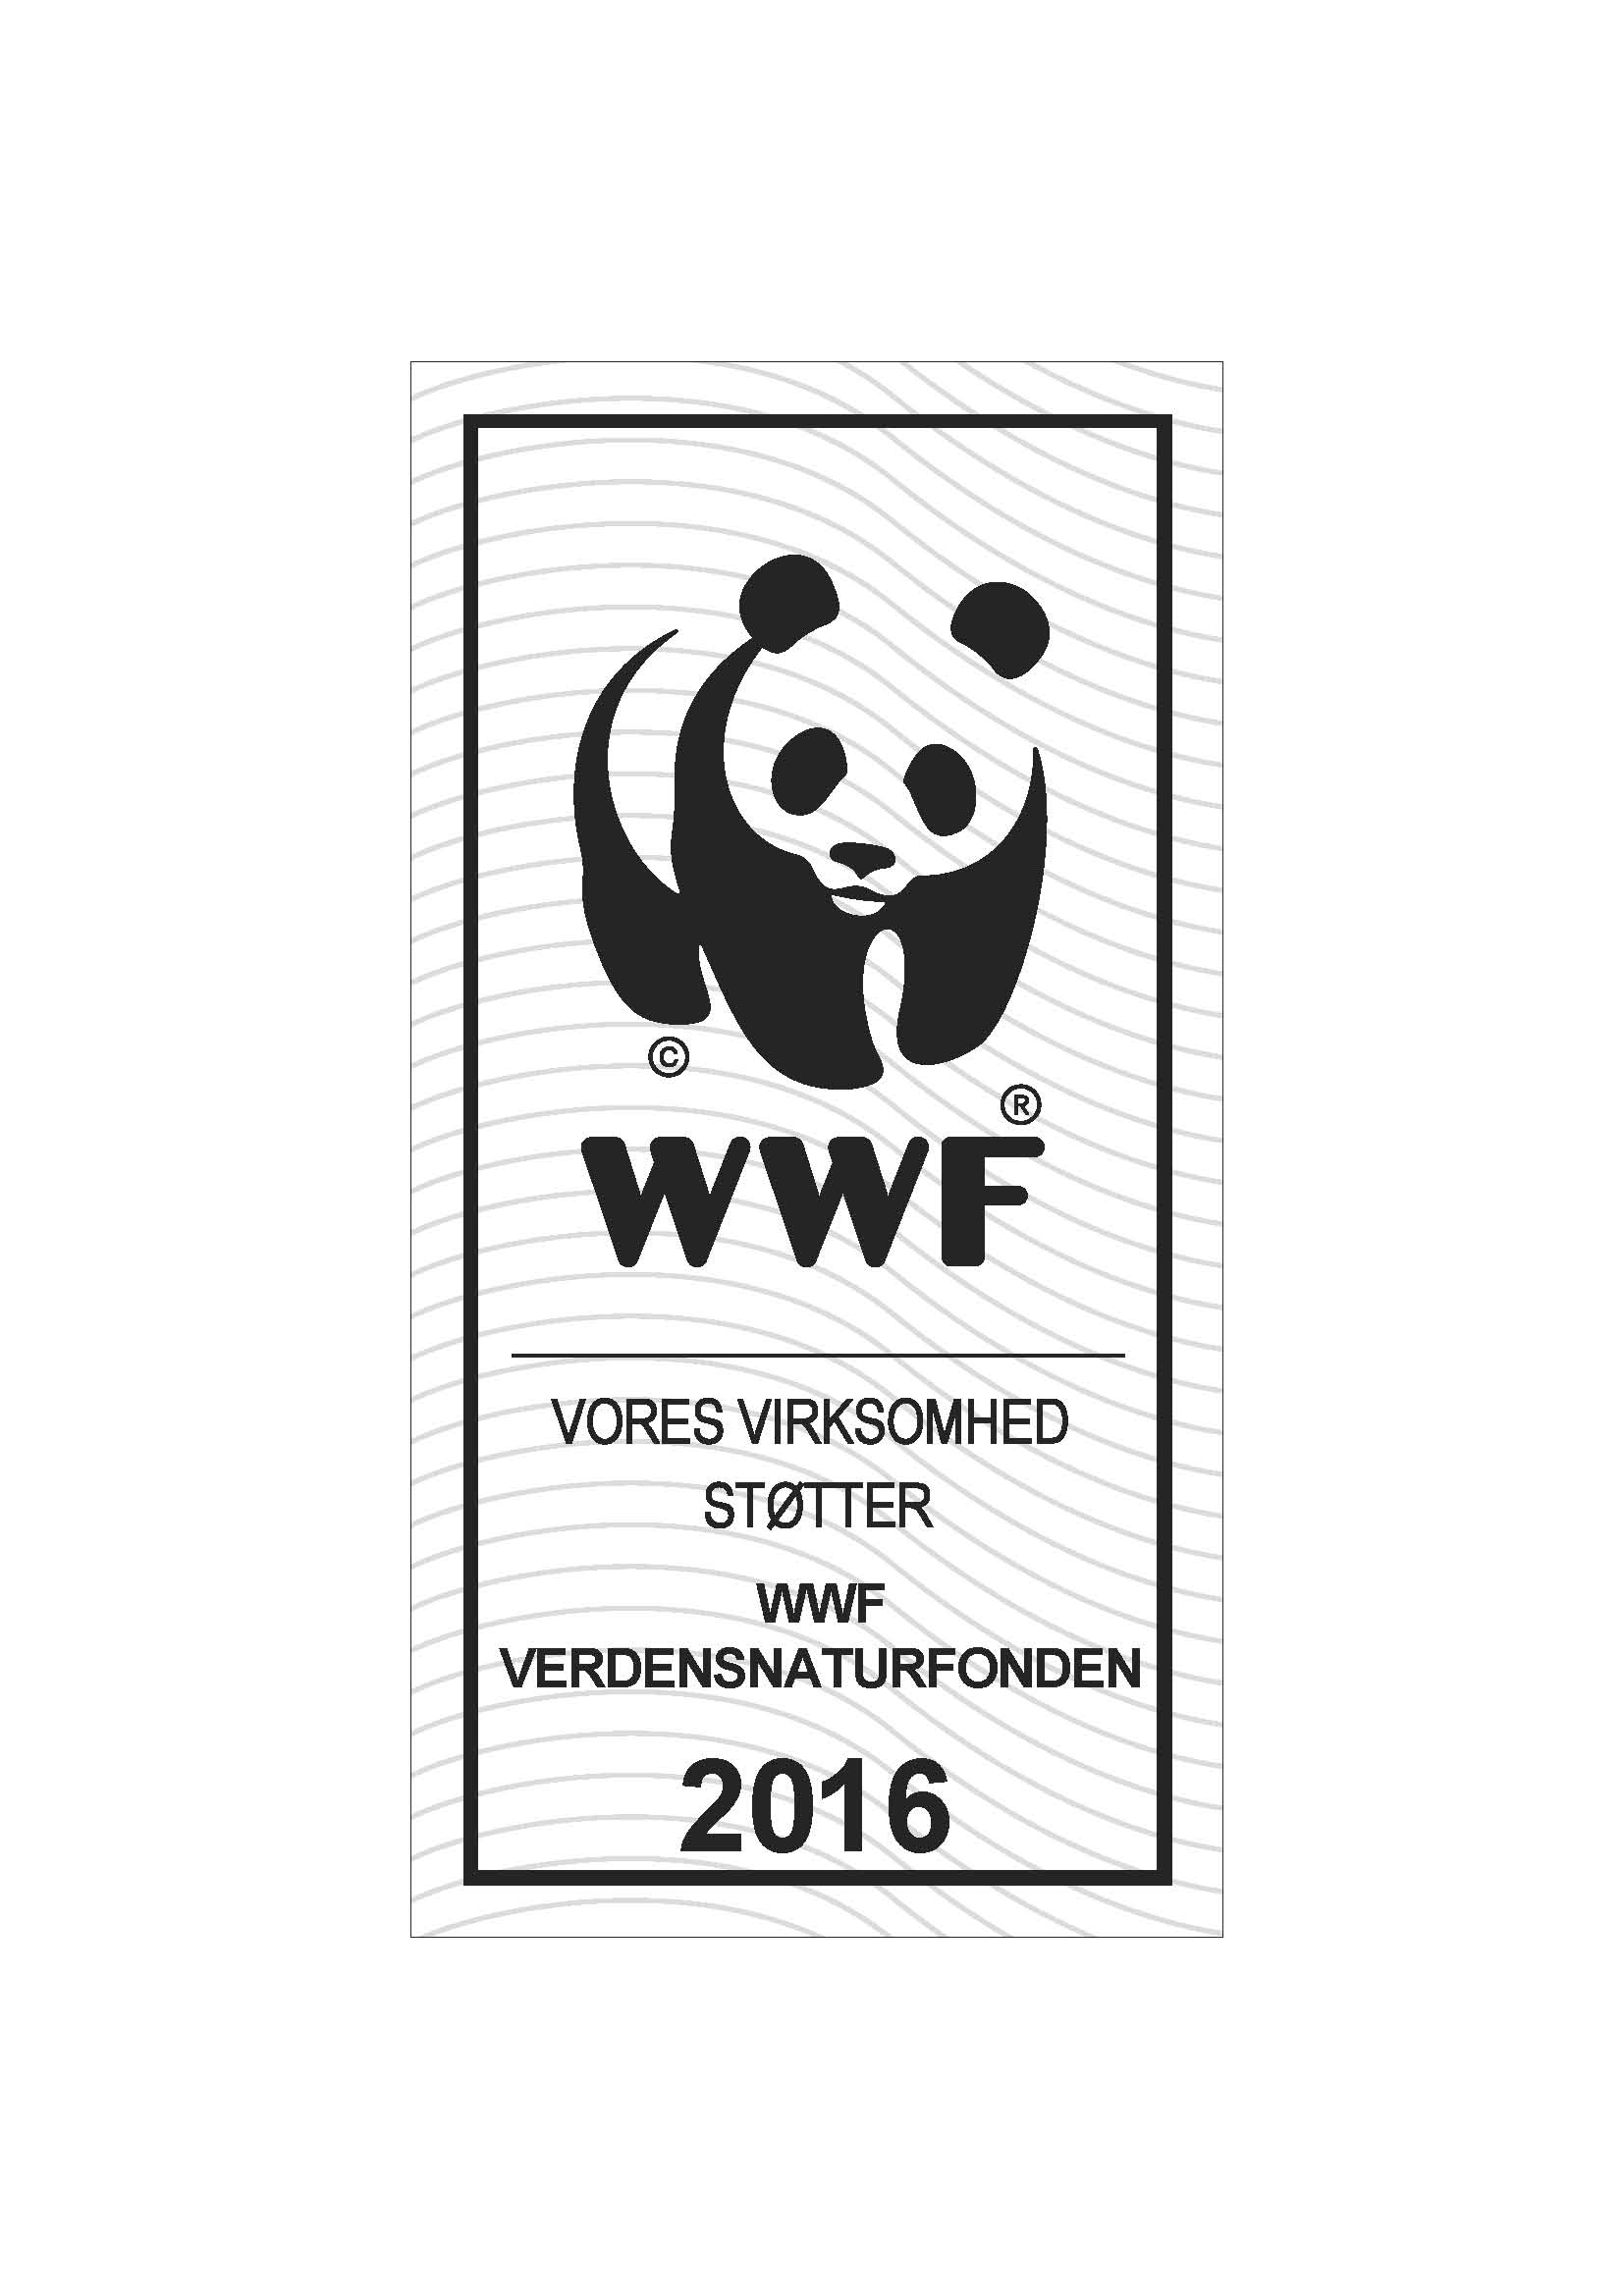 WWF-Virk-webstoettelogo-2016